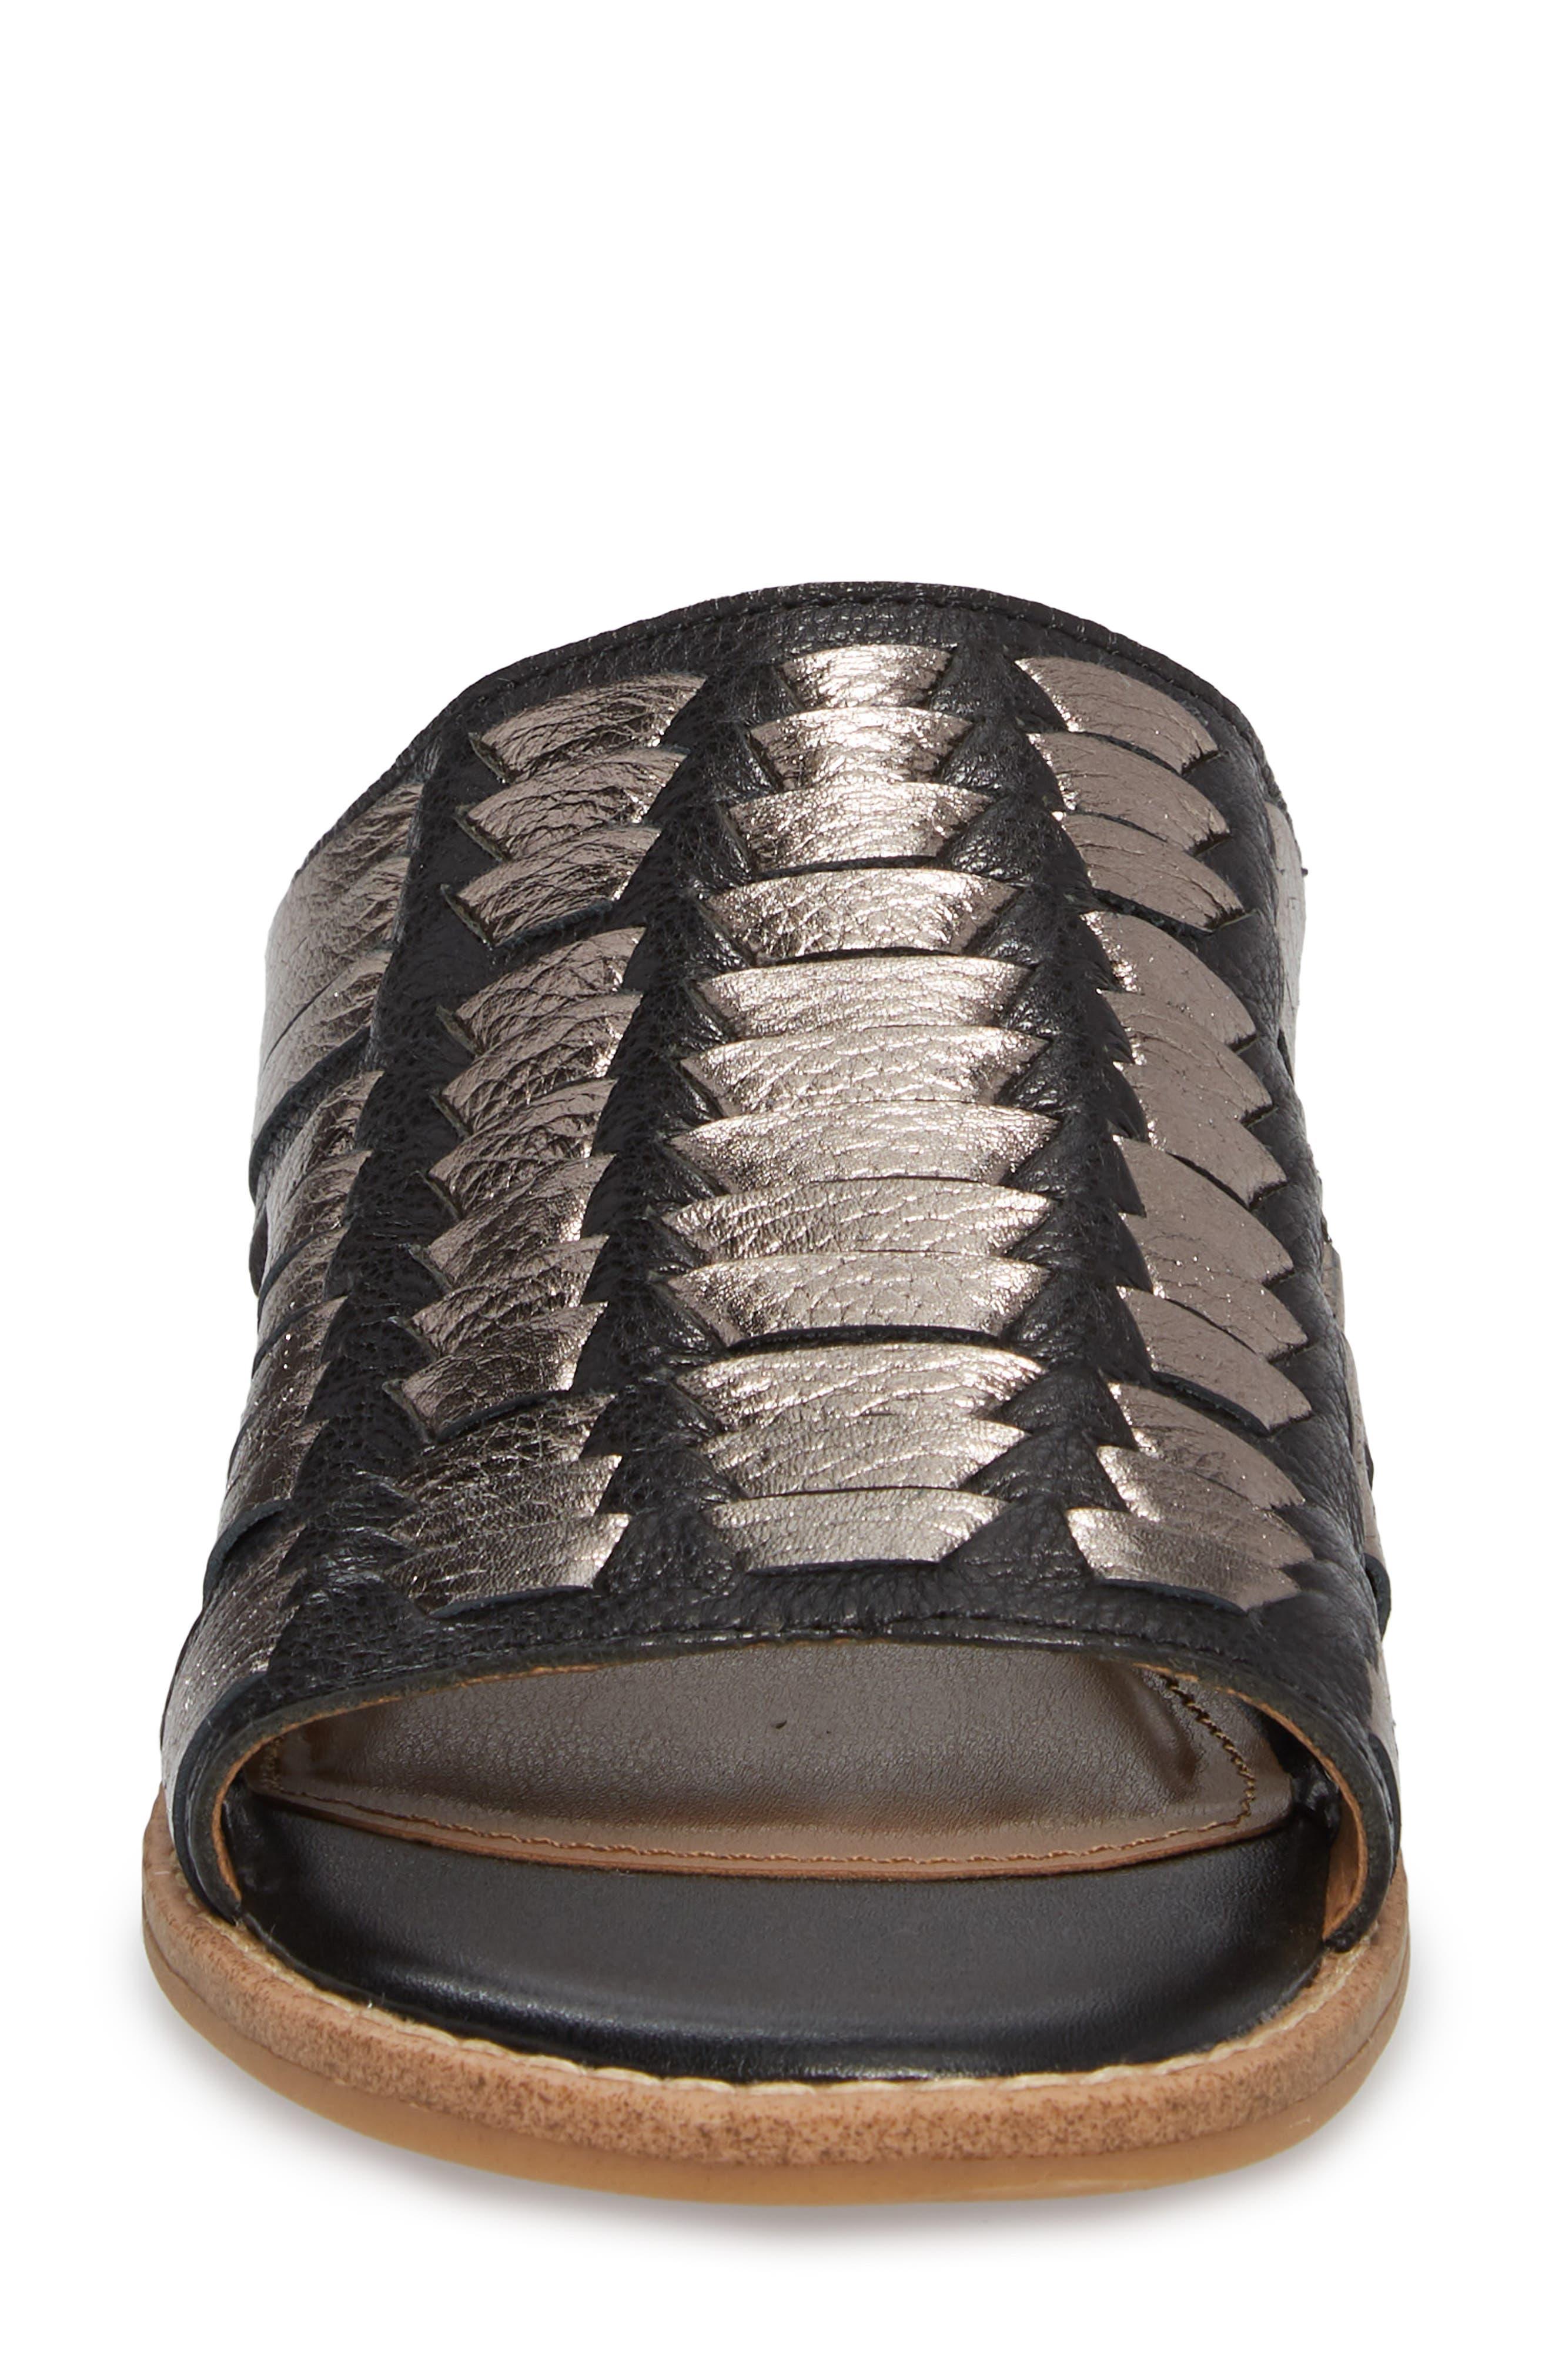 Brileigh Slide Sandal,                             Alternate thumbnail 4, color,                             Black Leather